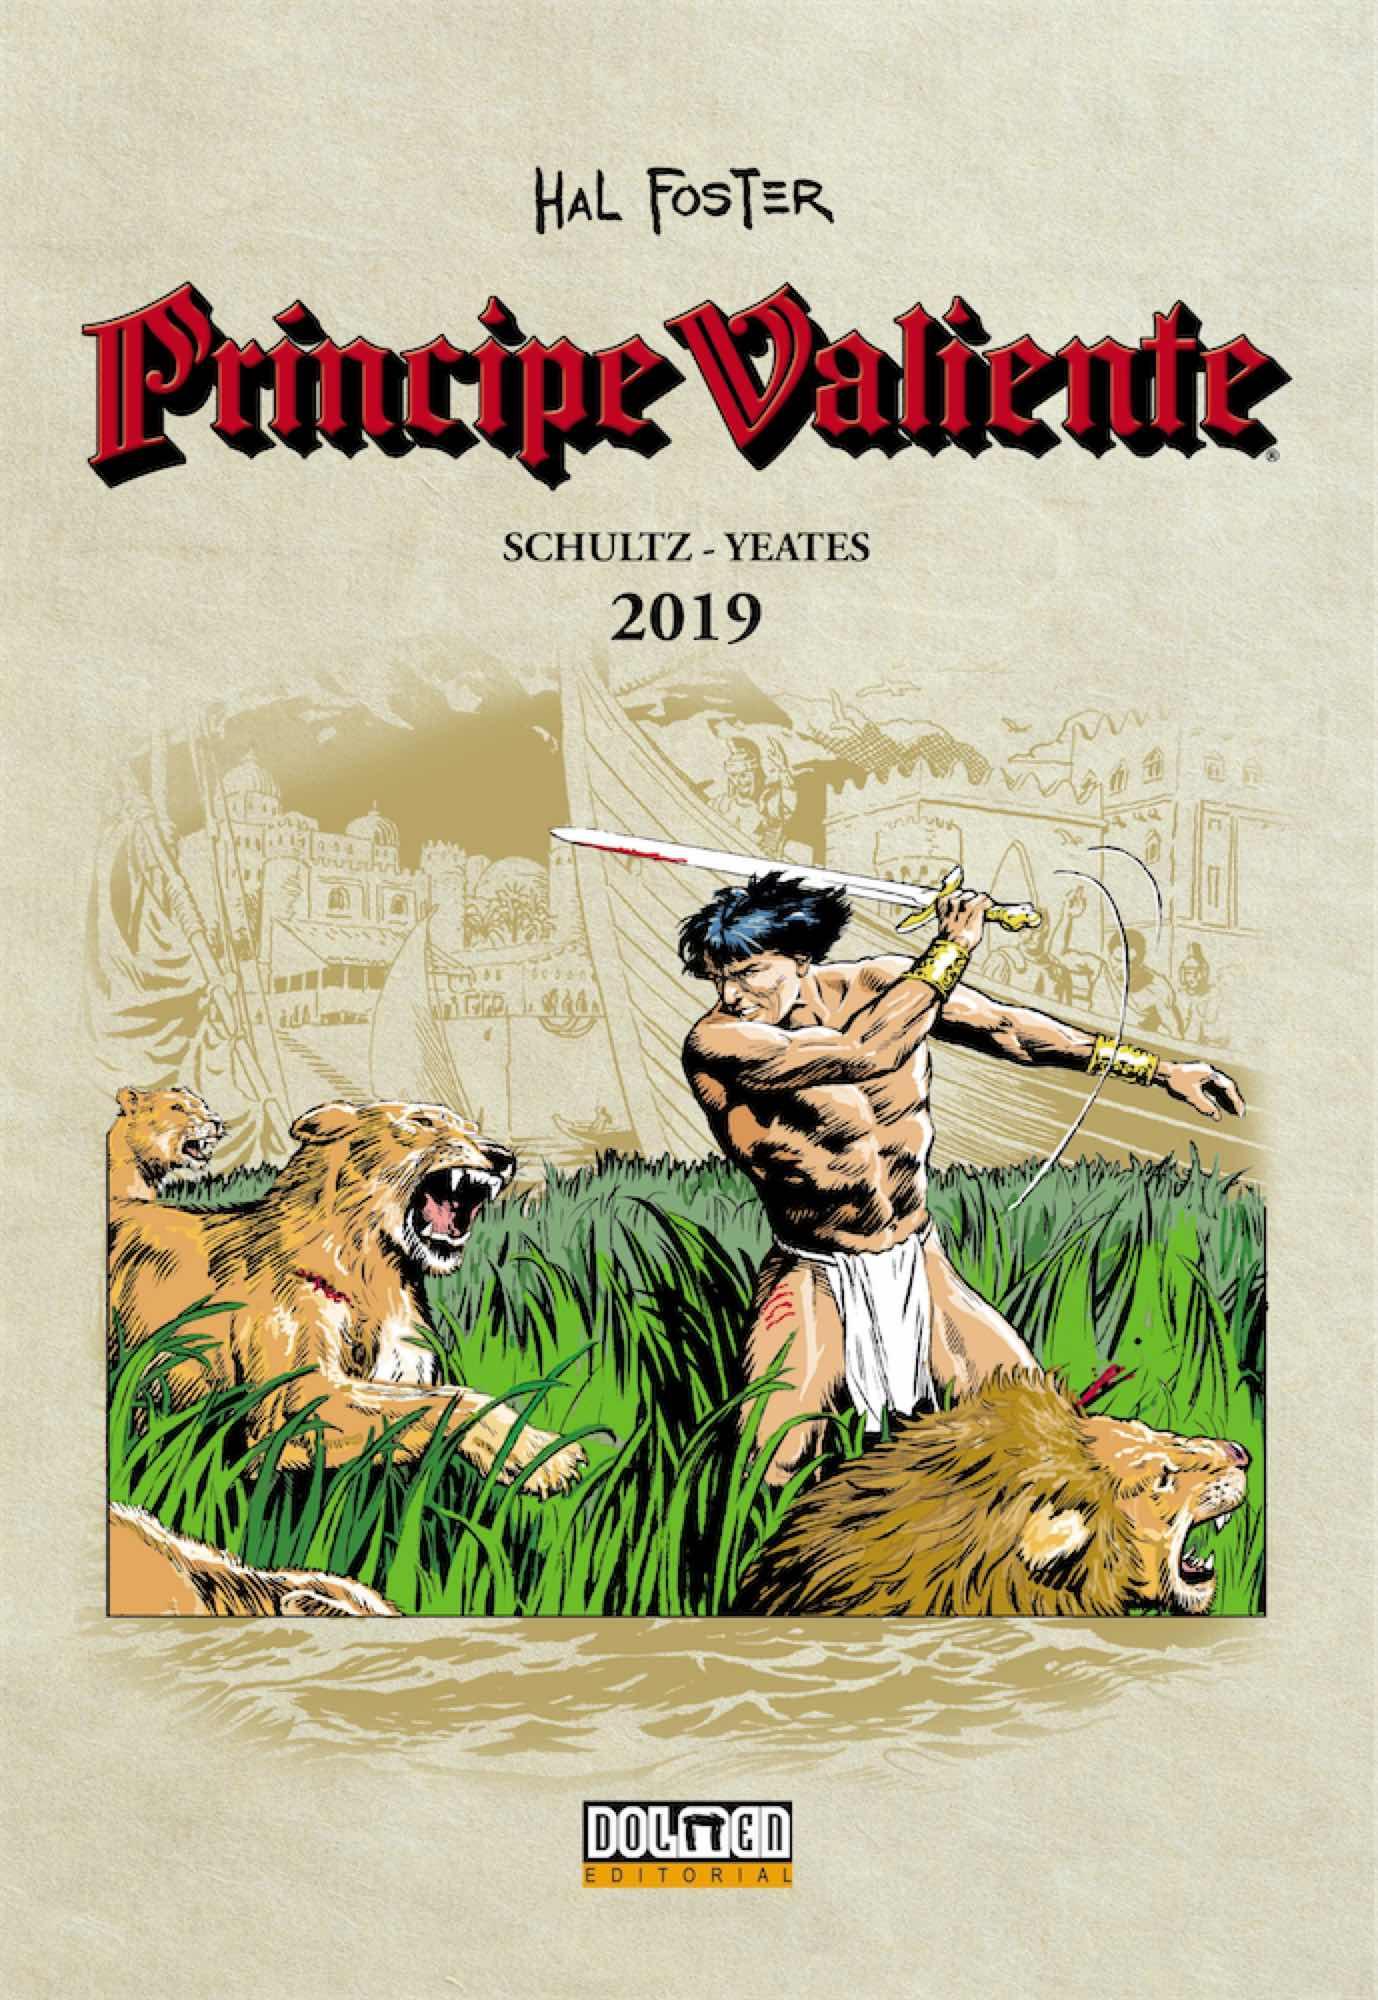 PRINCIPE VALIENTE 2019